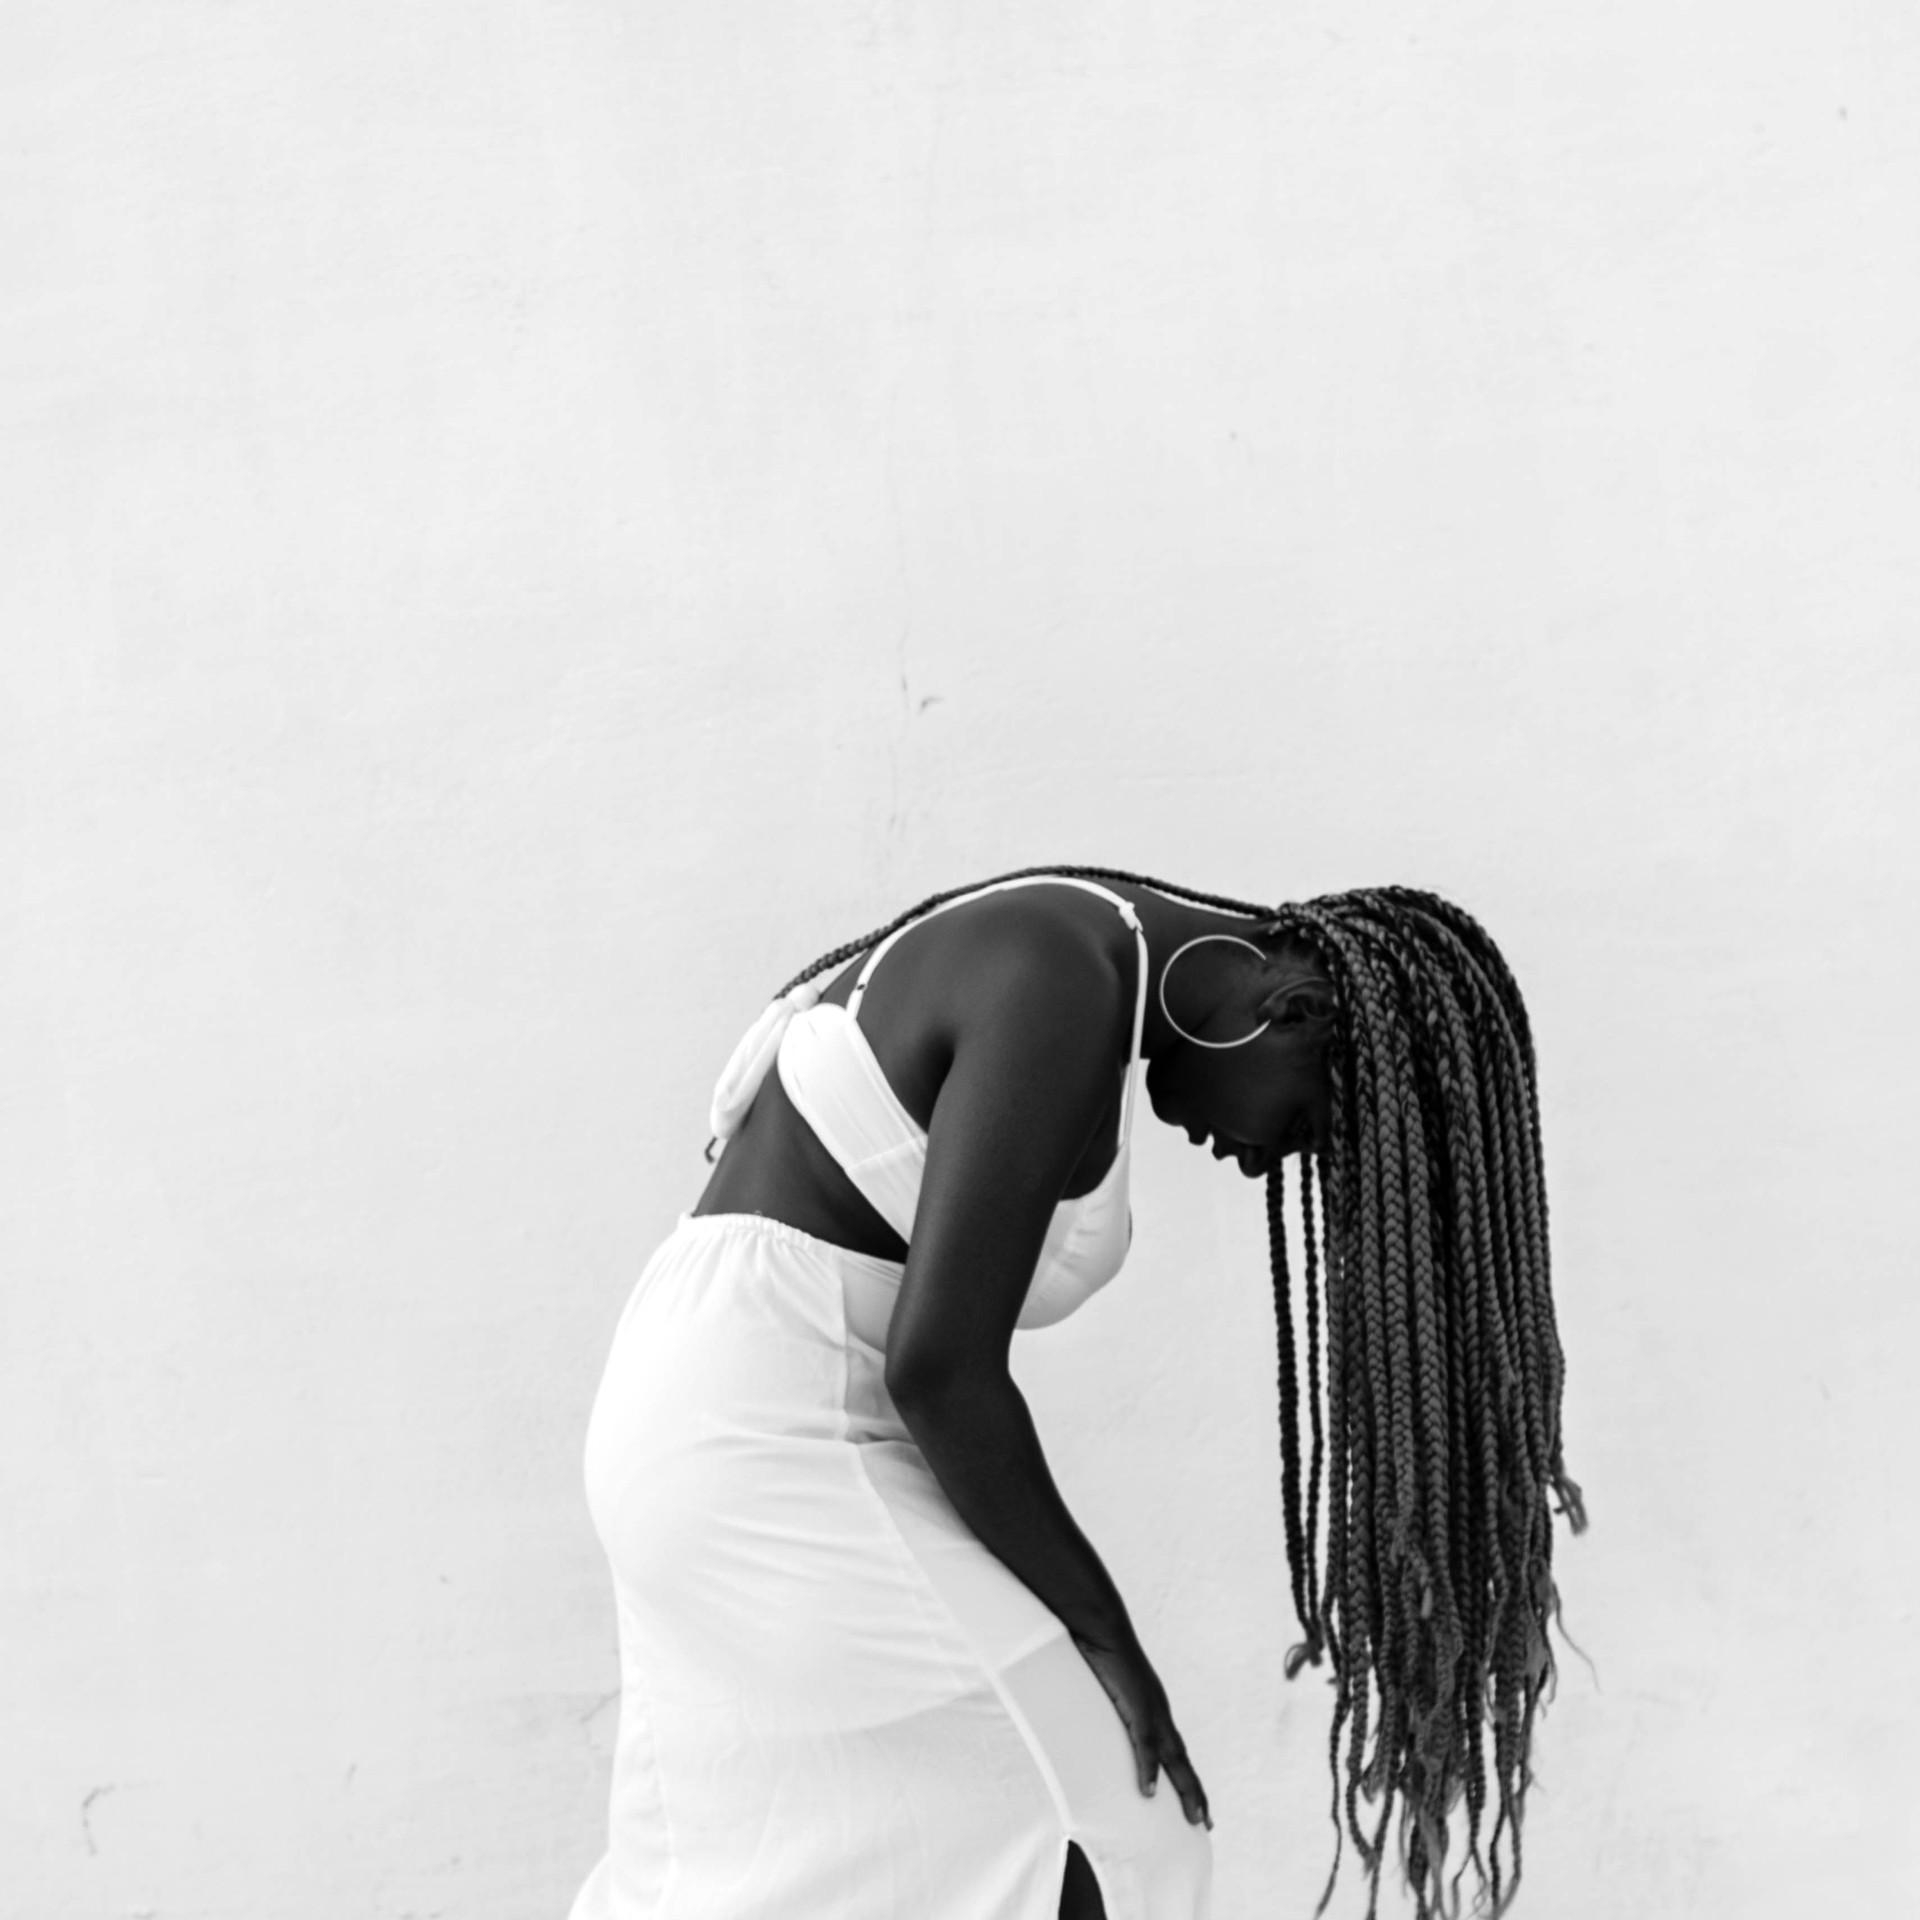 Photo: Pexels.com@Fillipe Gomes Title: Woman Wearing White Dress